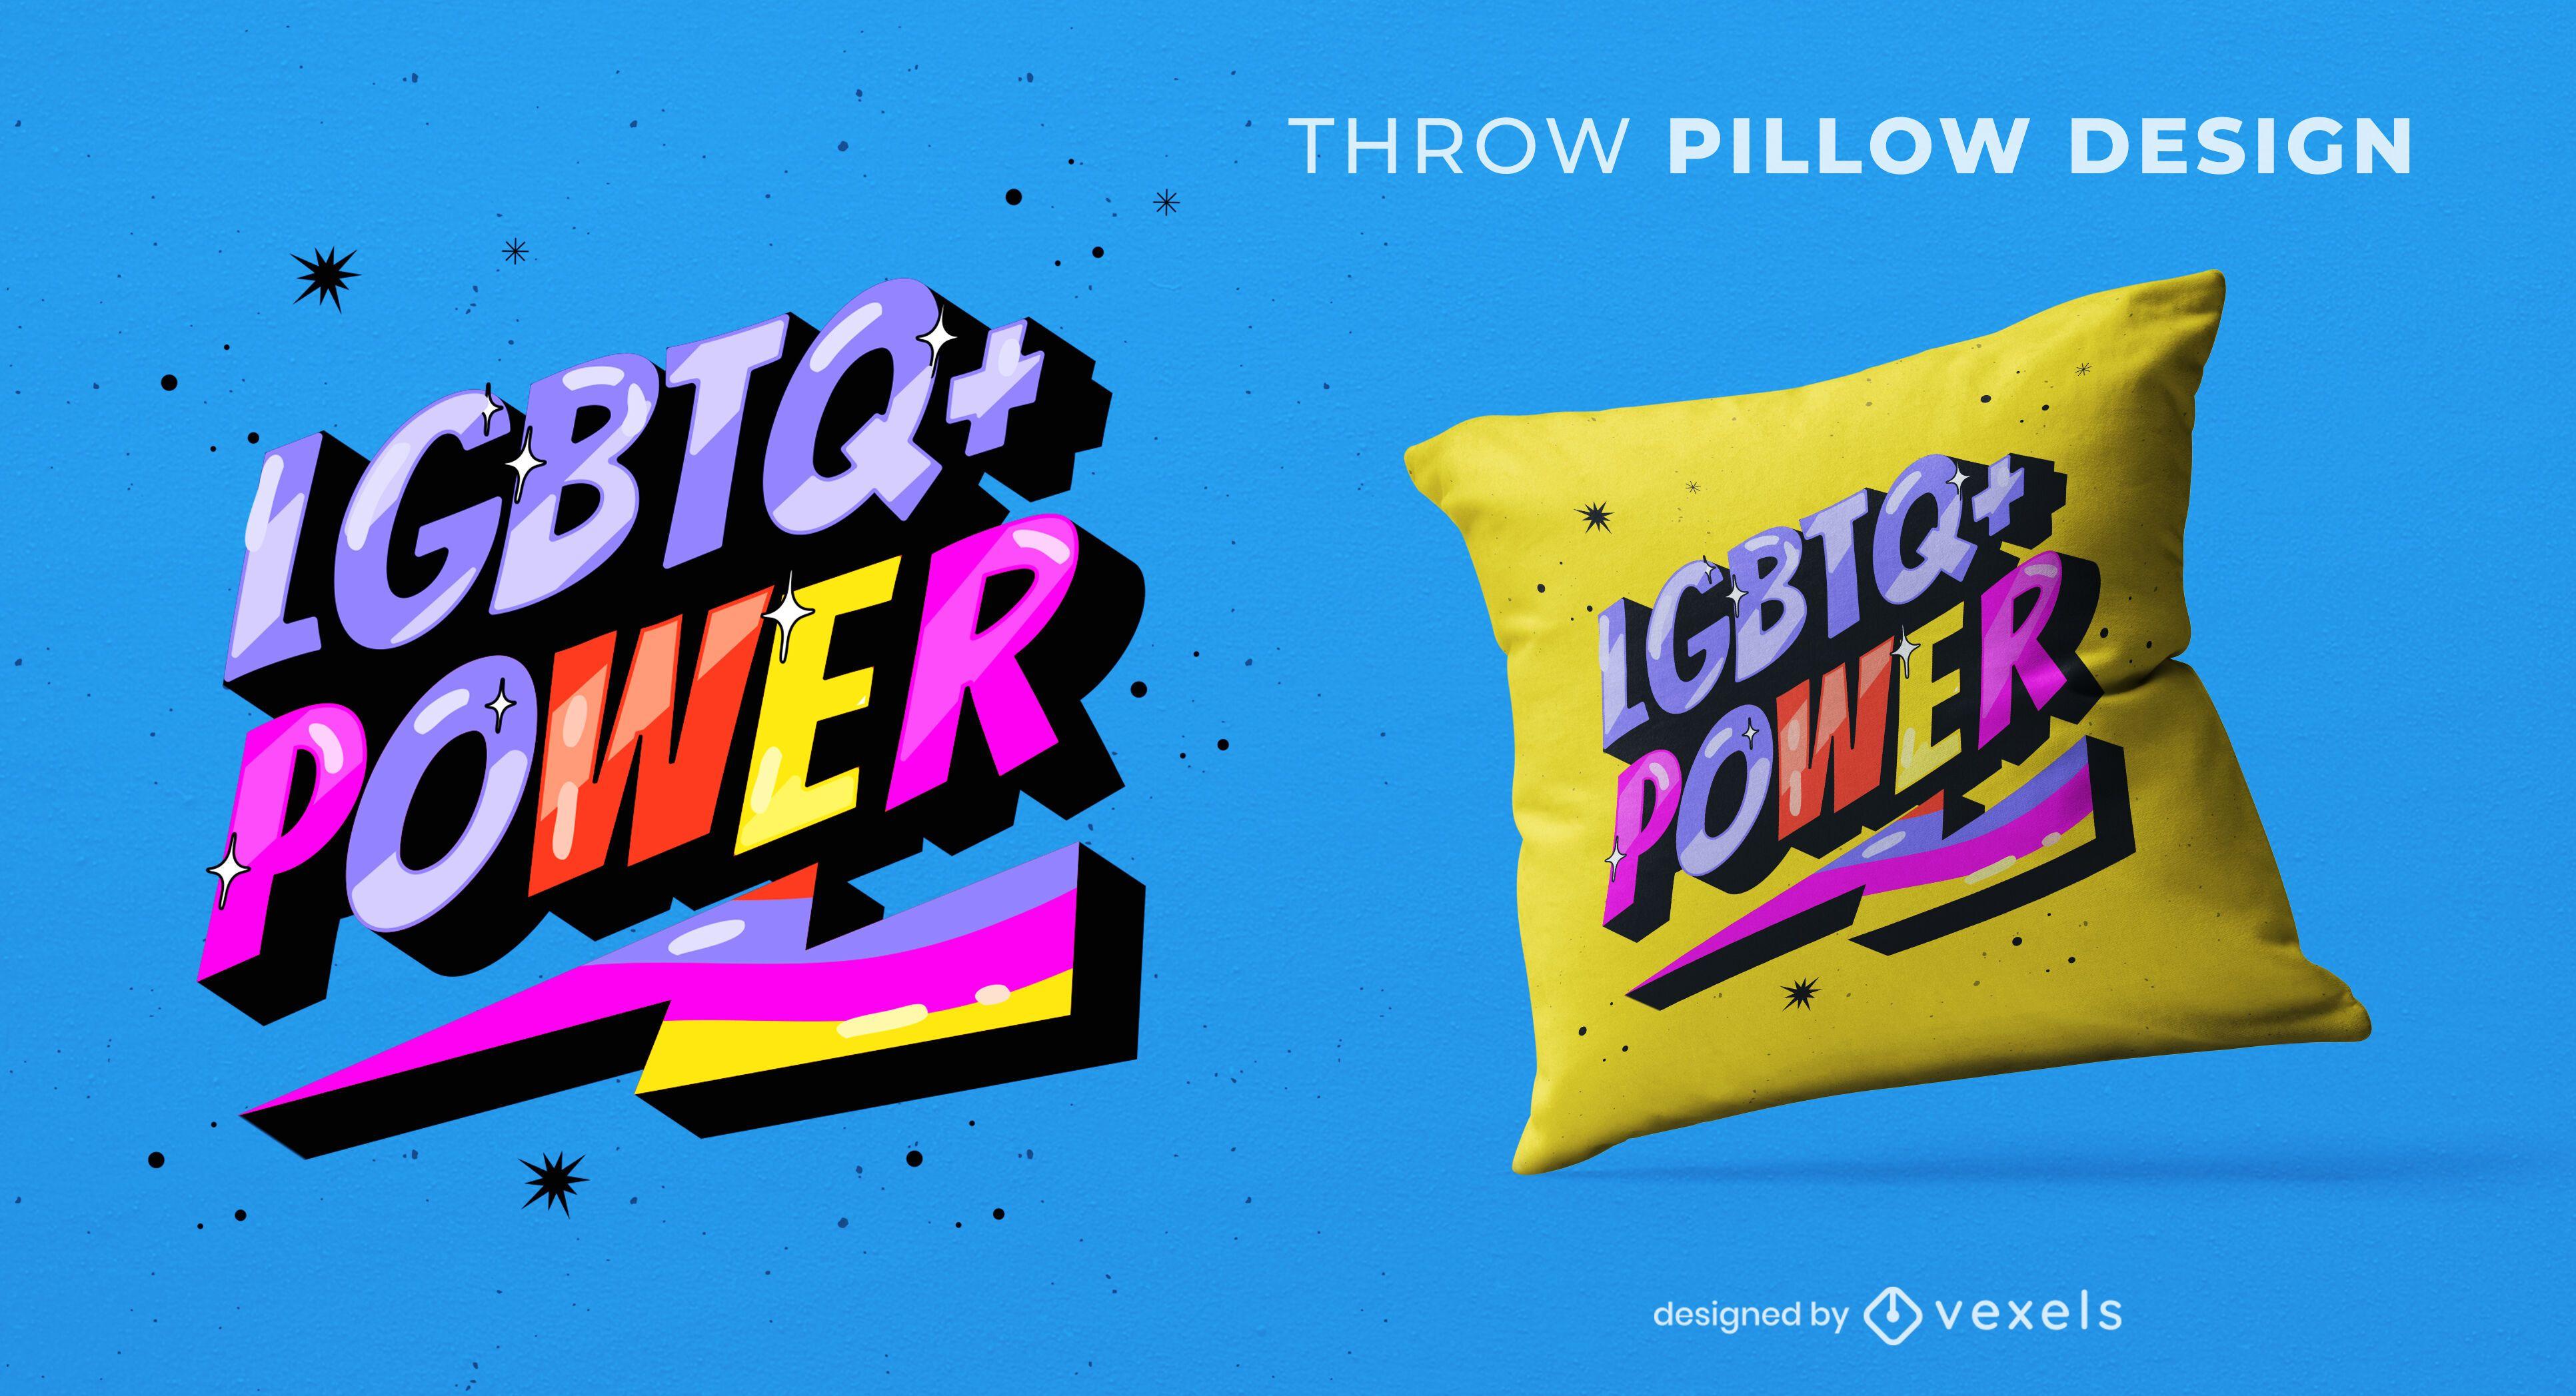 Lgtb power quote diseño de almohada